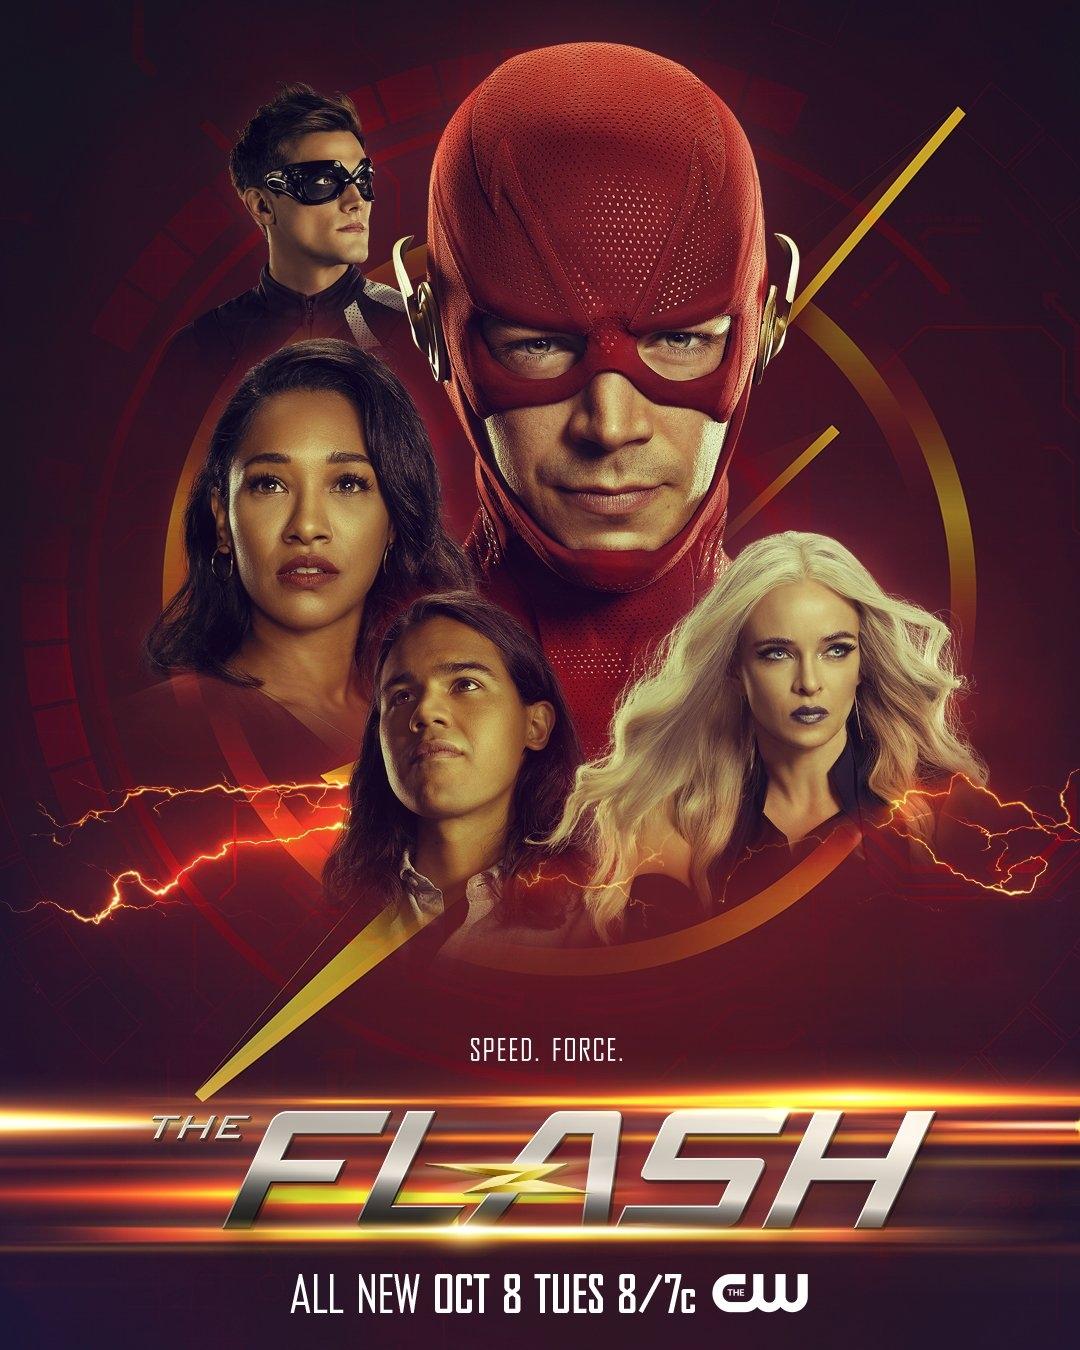 The Flash Season 6 Poster ⚡️